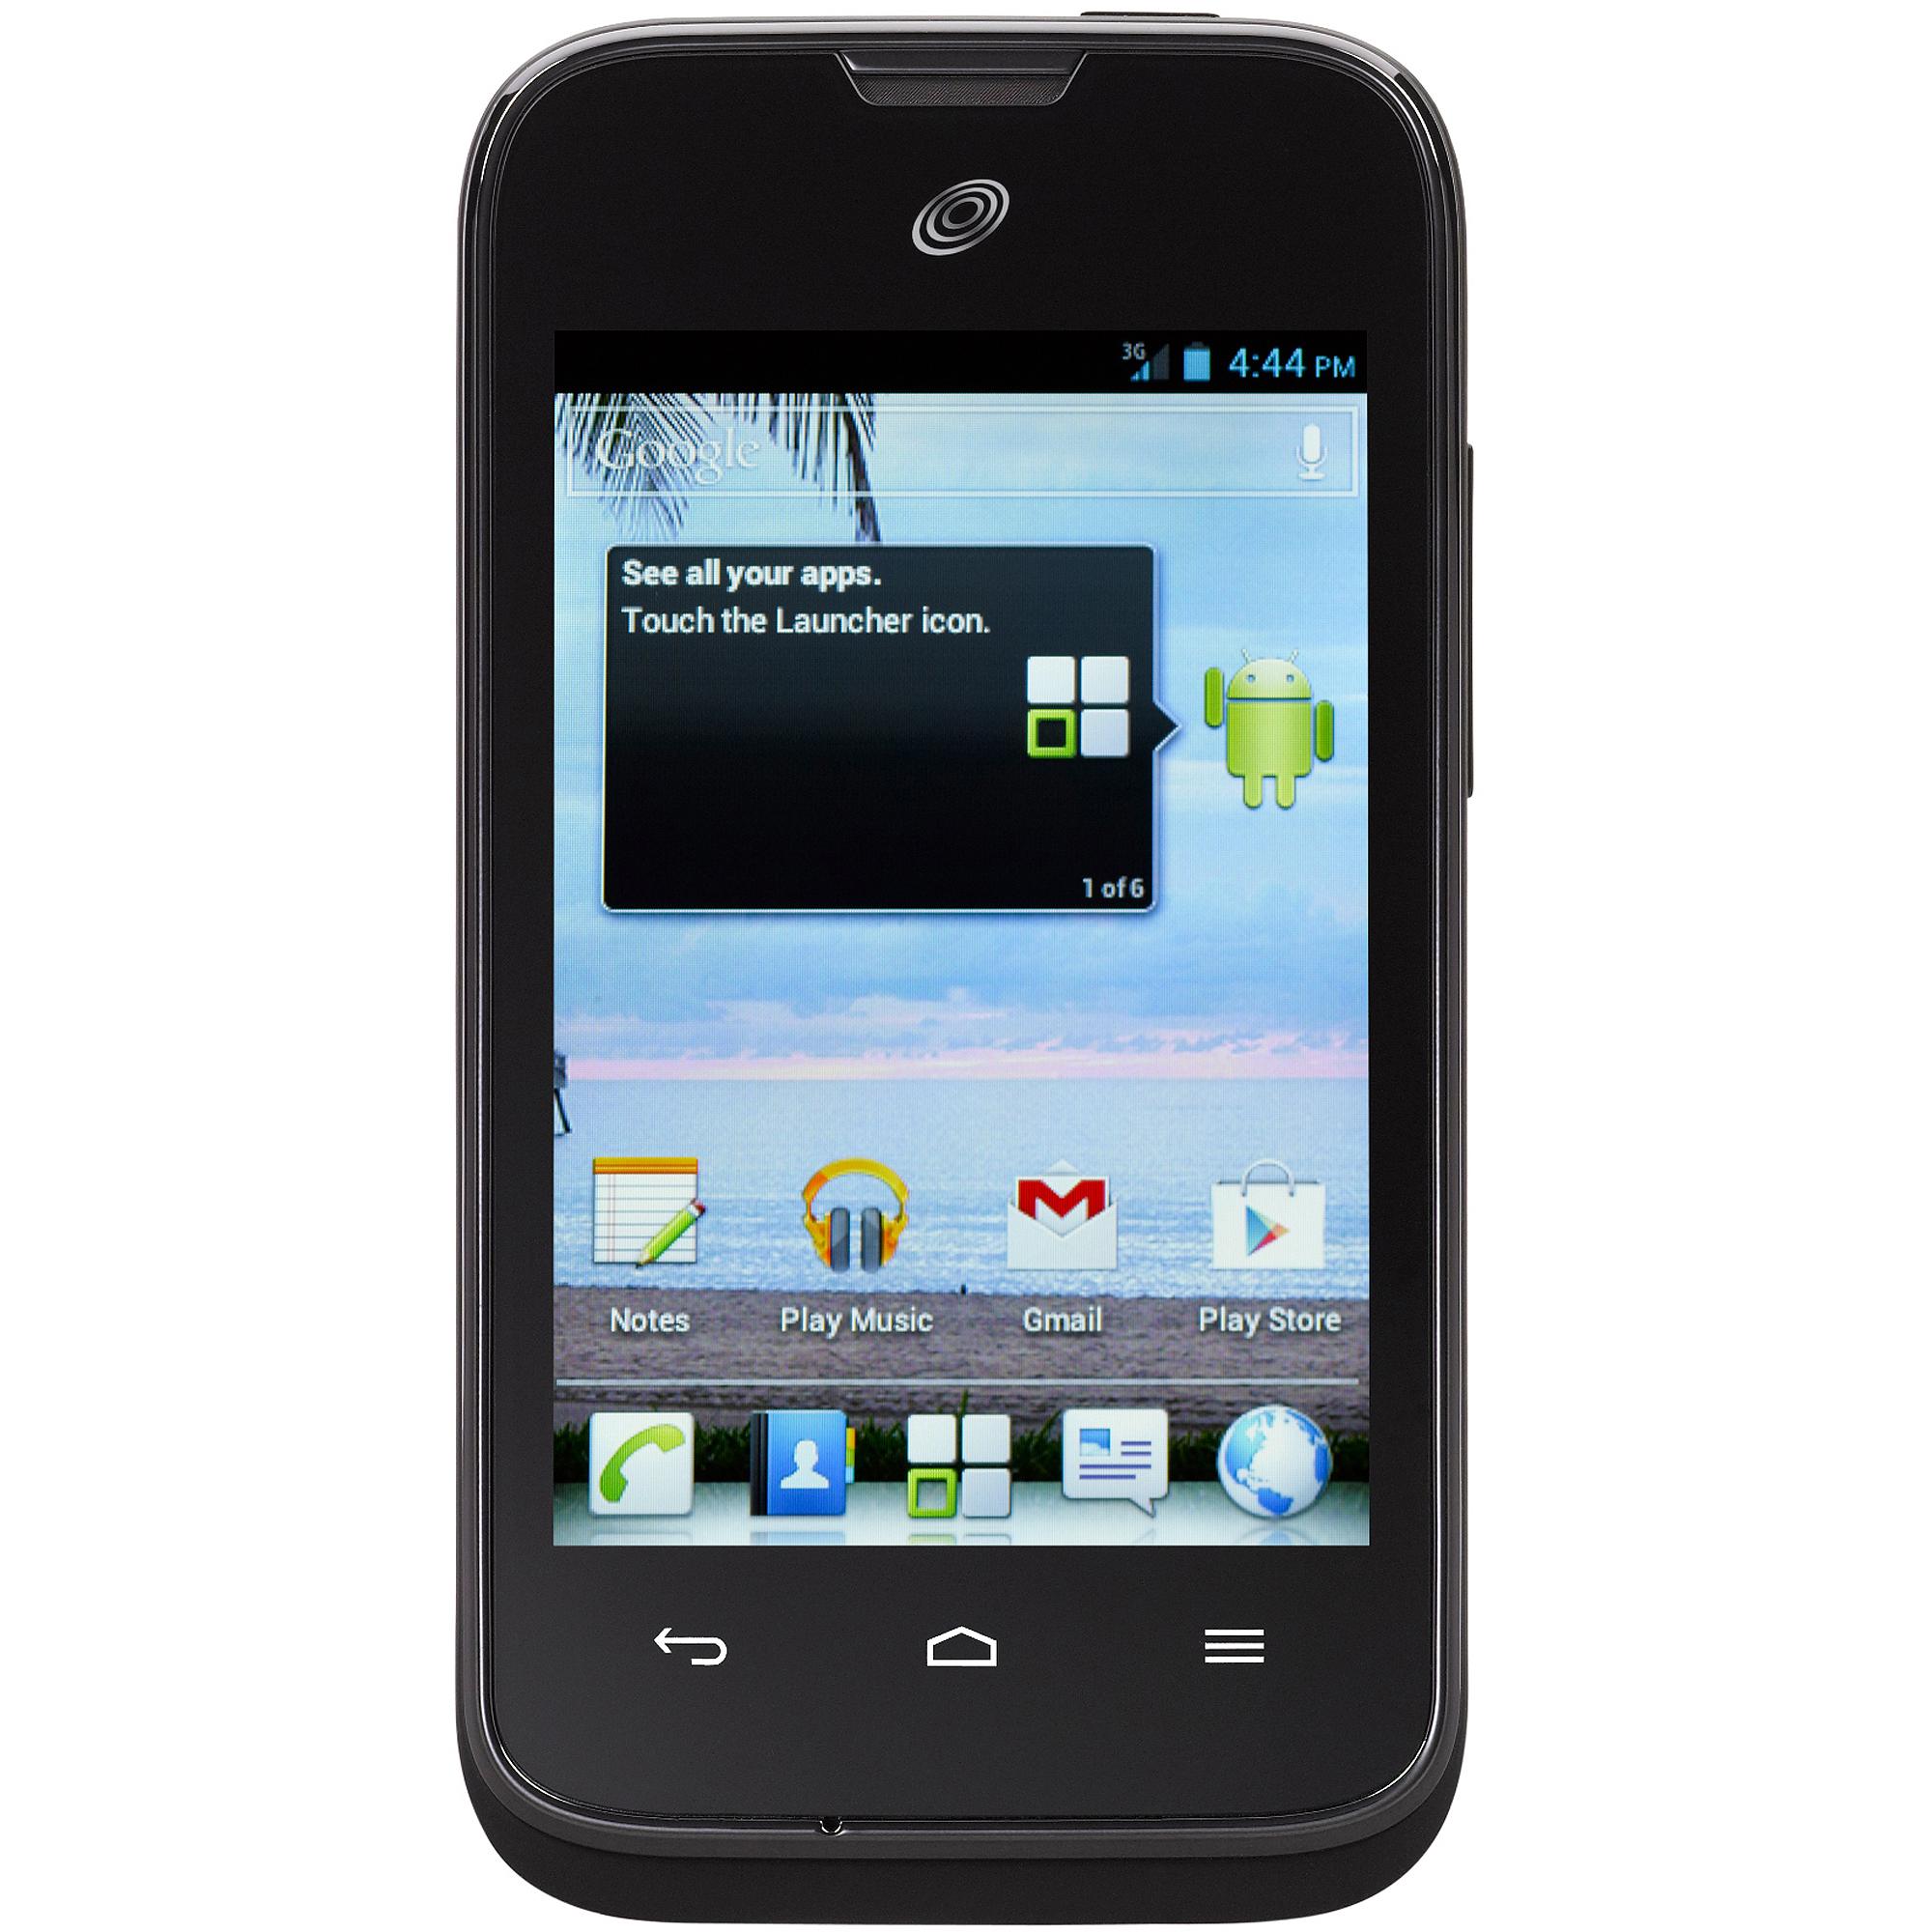 Net10 Huawei Inspira Android Prepaid Smartphone